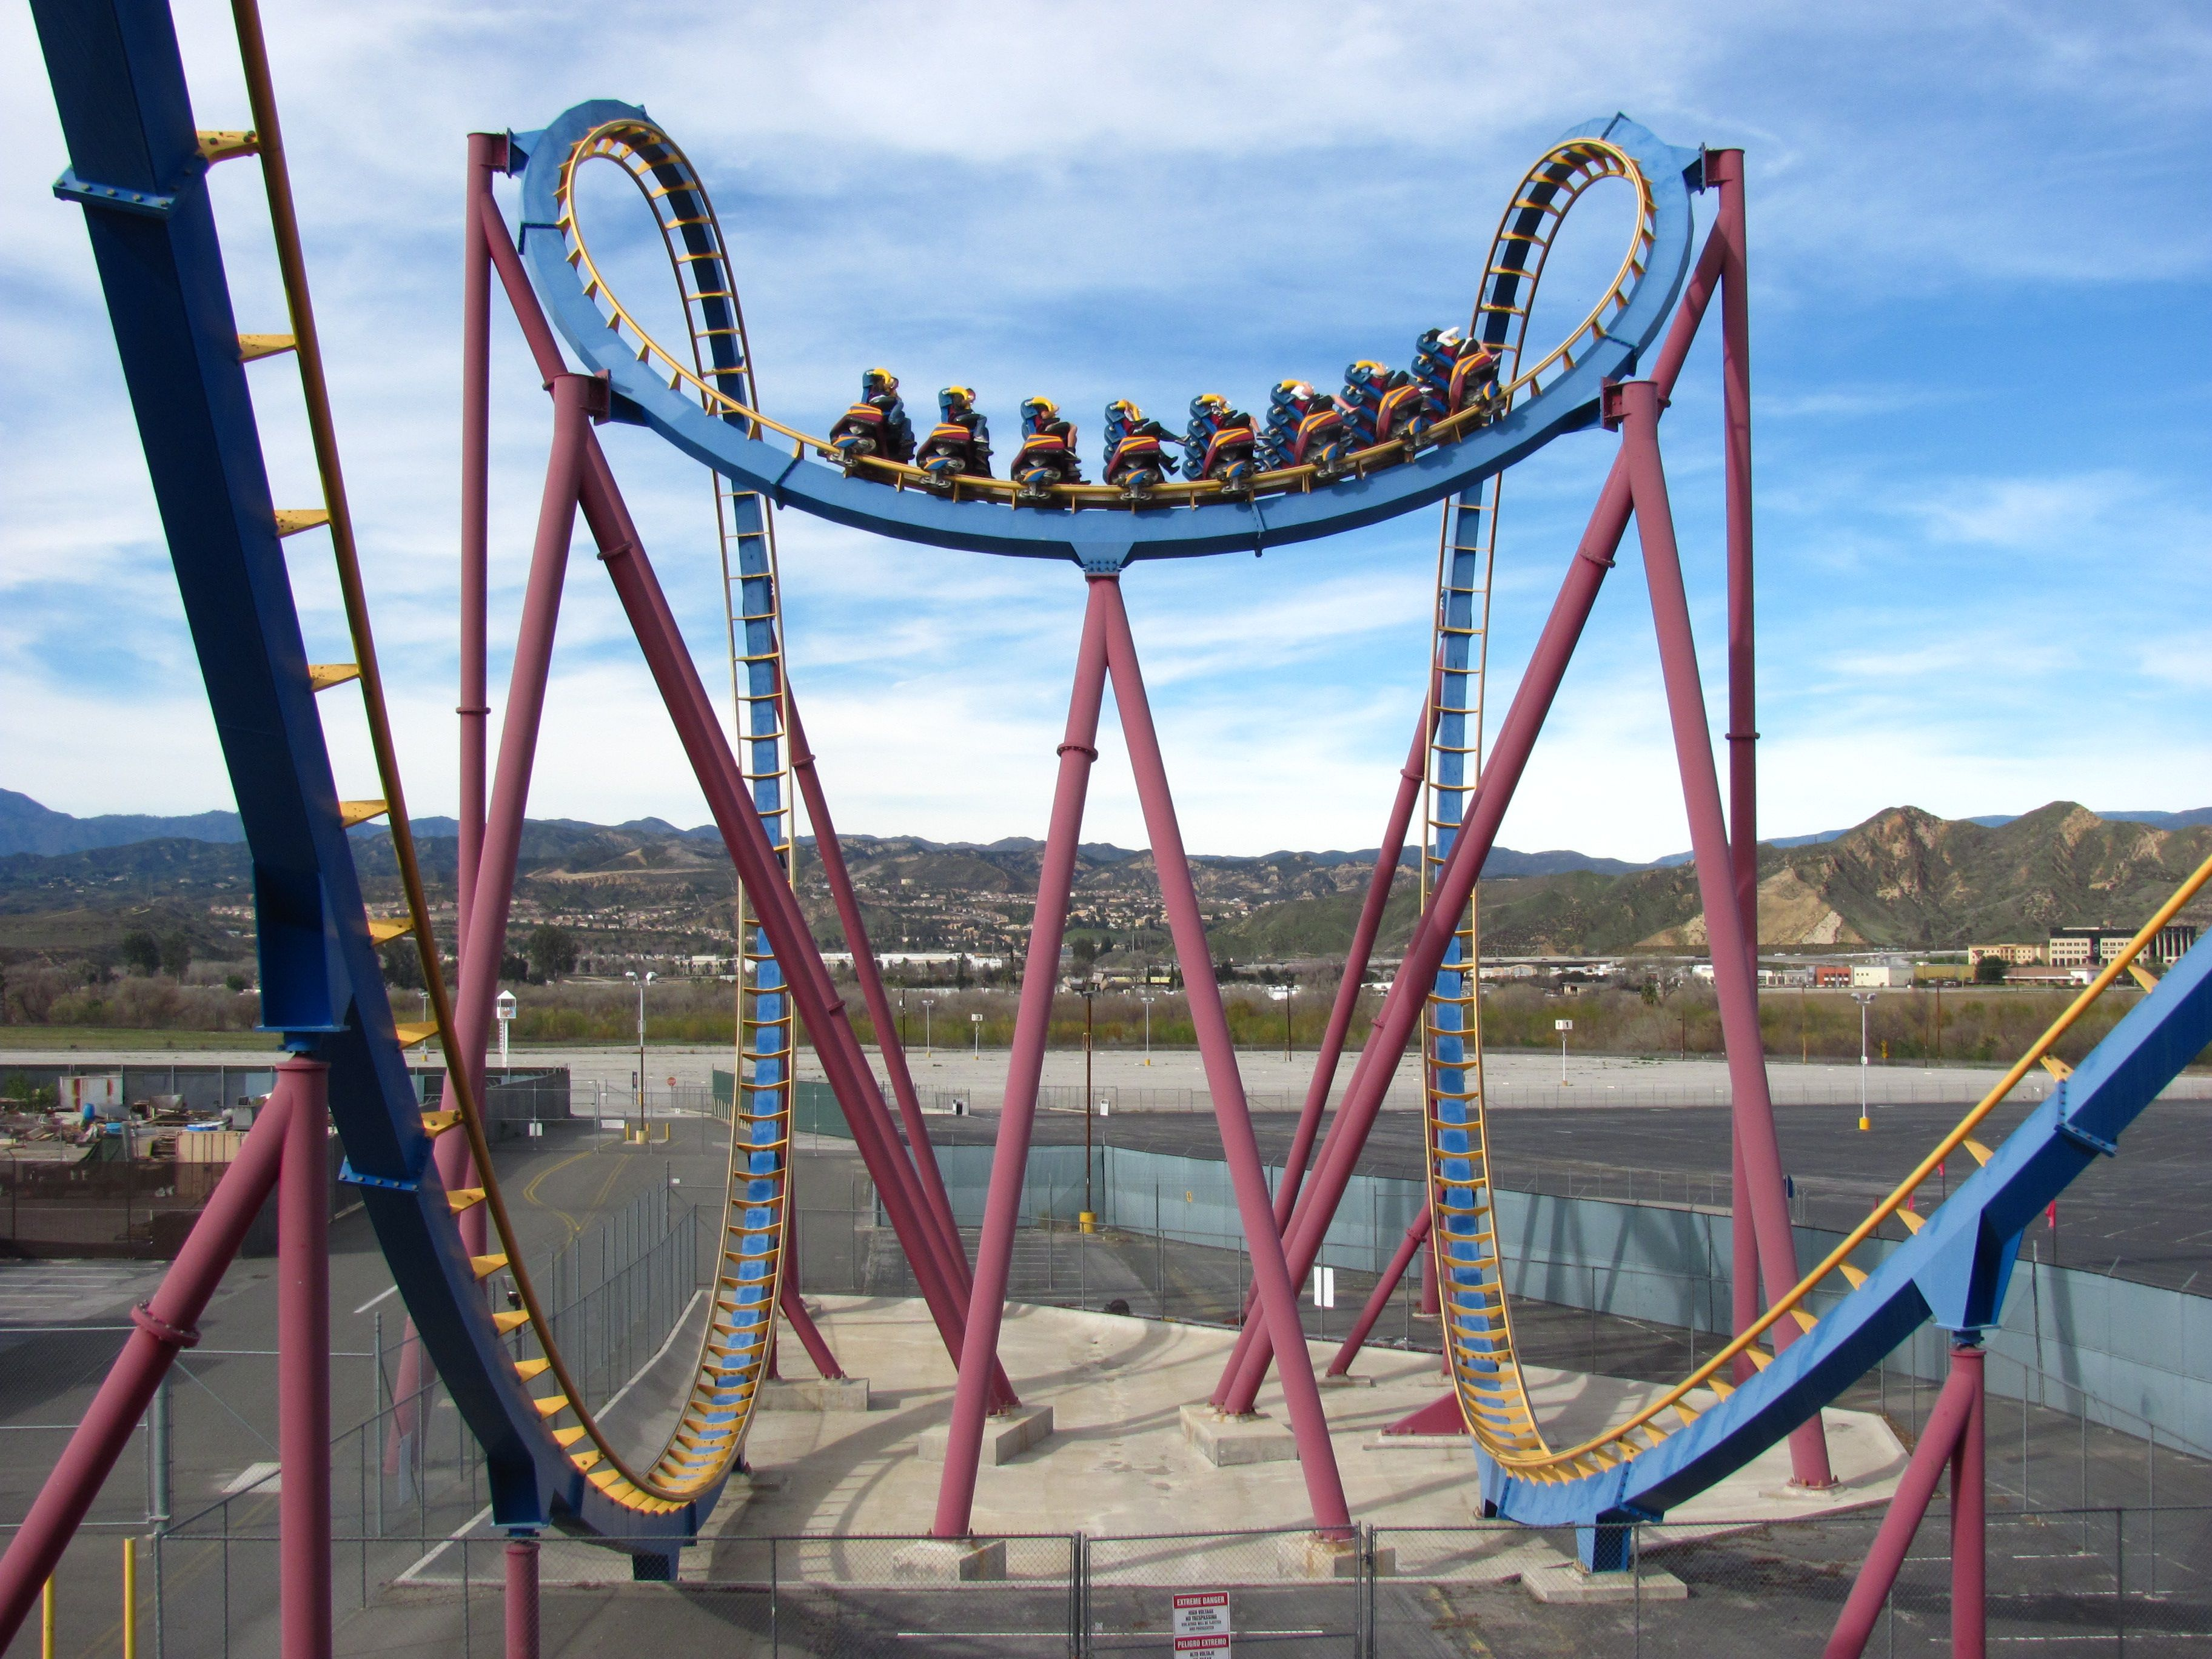 Santaclarita Scv Valencia Santaclaritavalley Sixflags Magicmountain California Tourist Attractions Six Flags Santa Clarita Valley